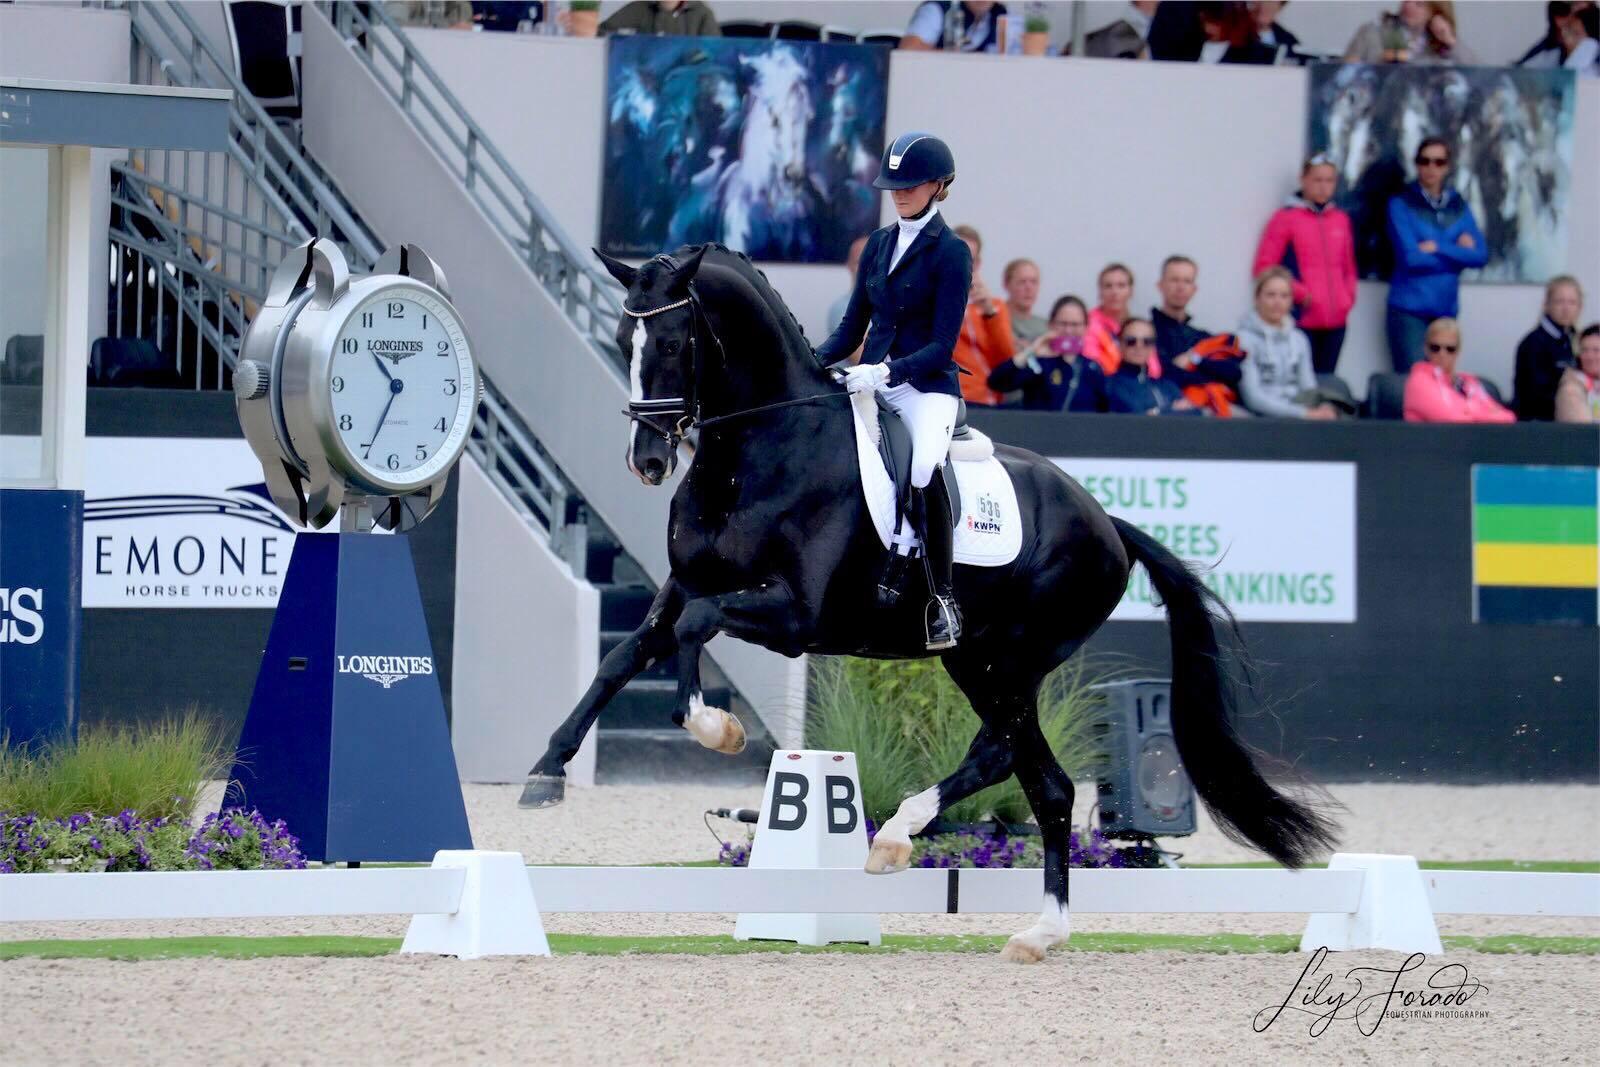 Jameson RS2 and Marieke van der Putten - photo credit: Lily Forado